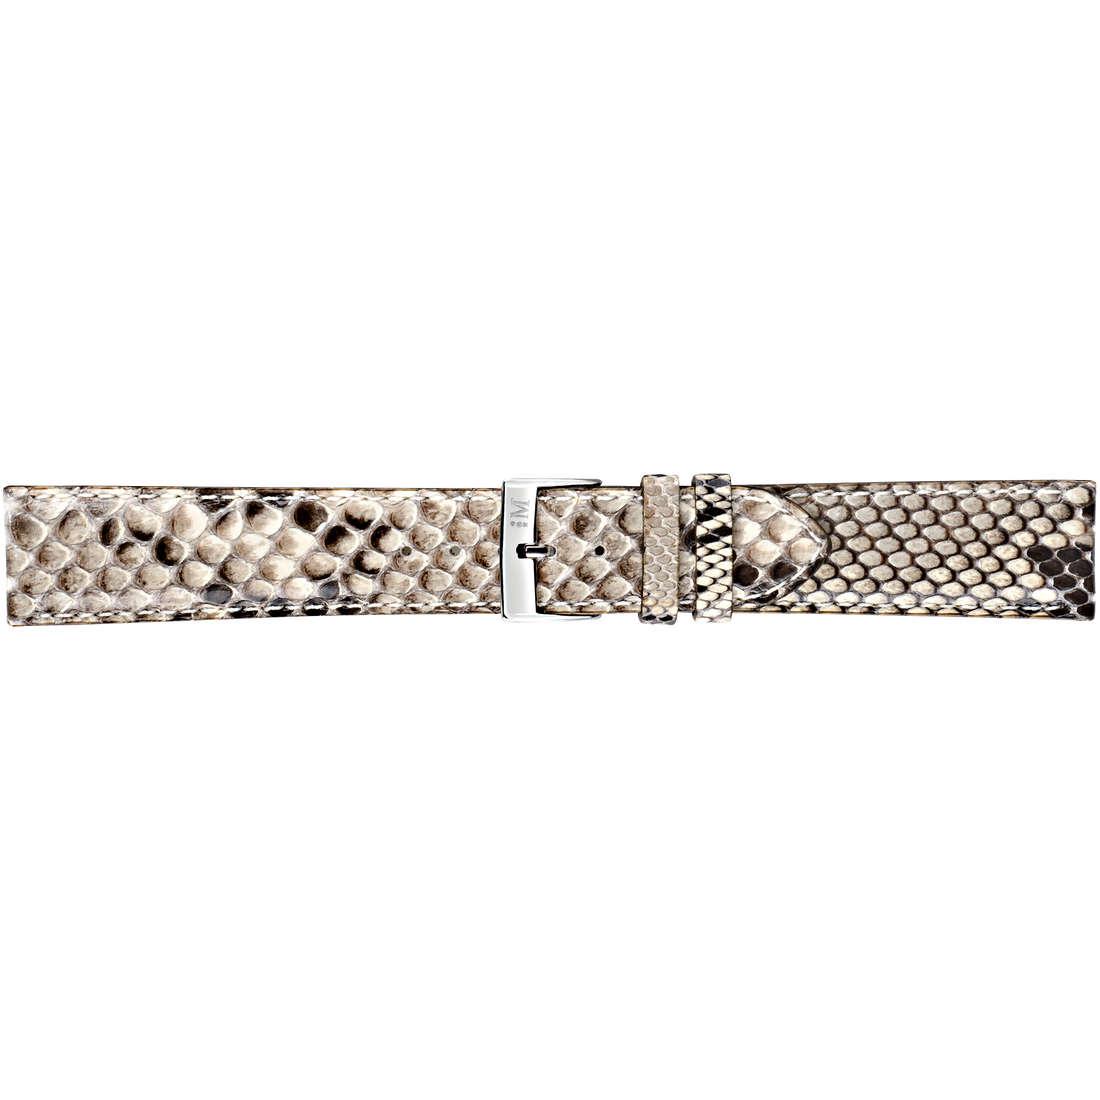 watch watch bands watch straps man Morellato Pelli Preziose A01X1458474024CR20